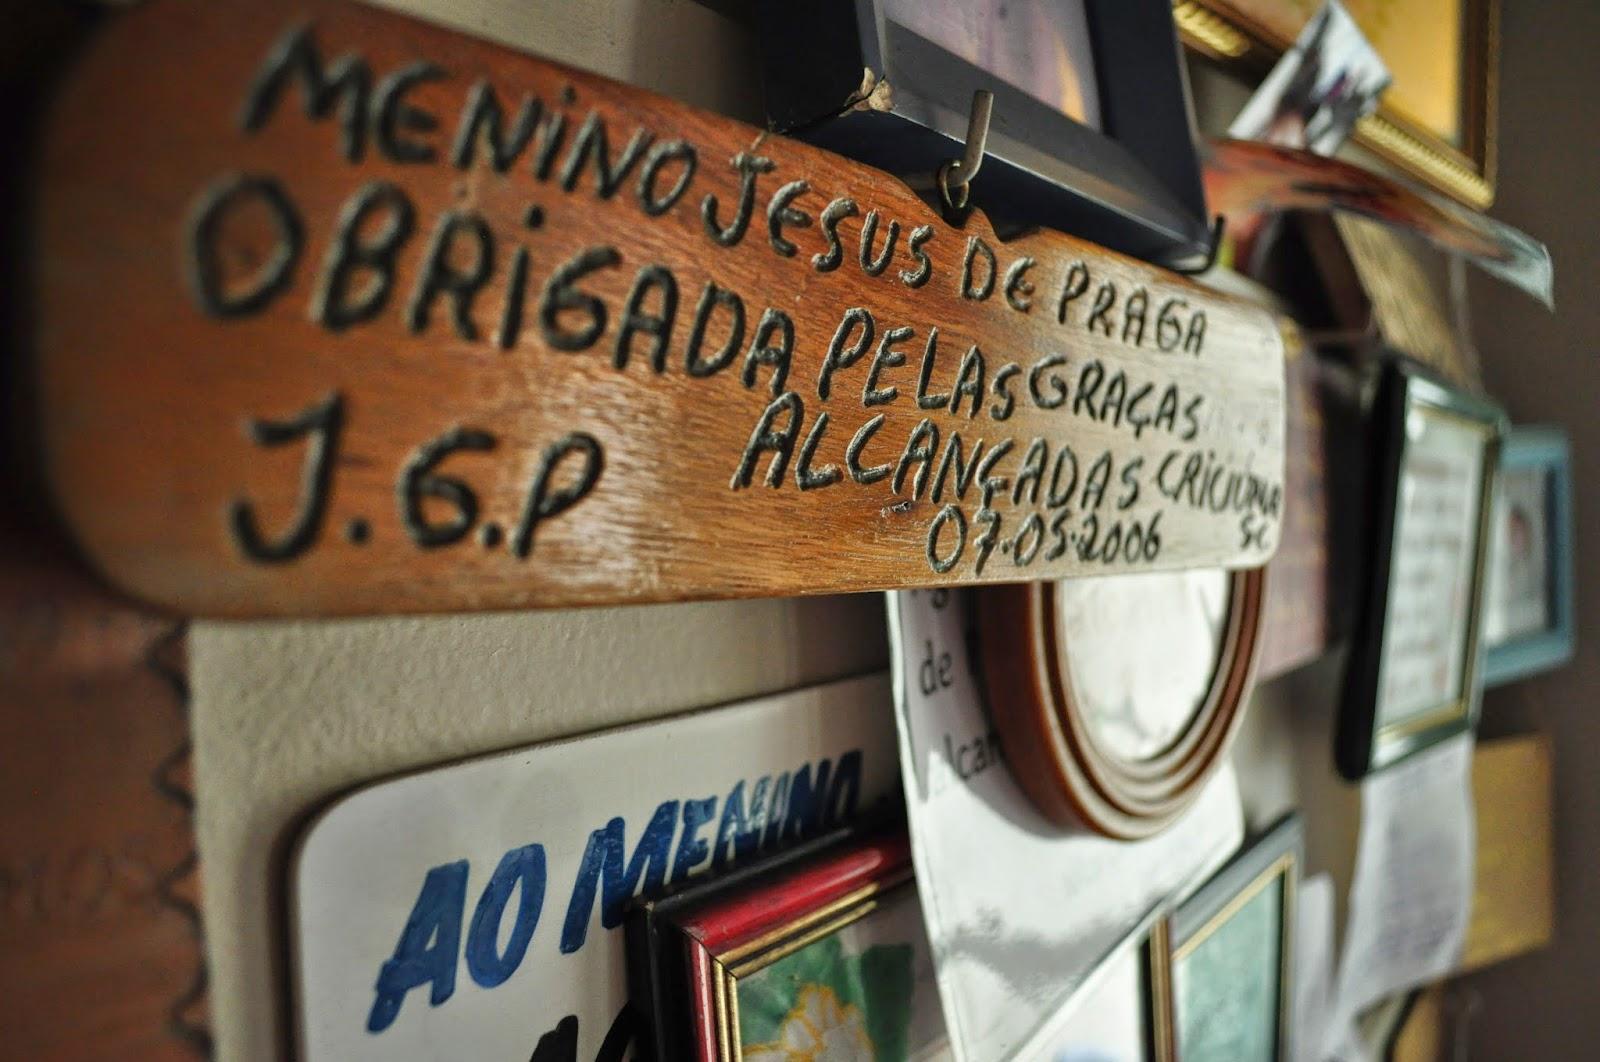 gracas_alcancadas_Menino_JesusPraga_Ararangua_FotoVicenzoBerti